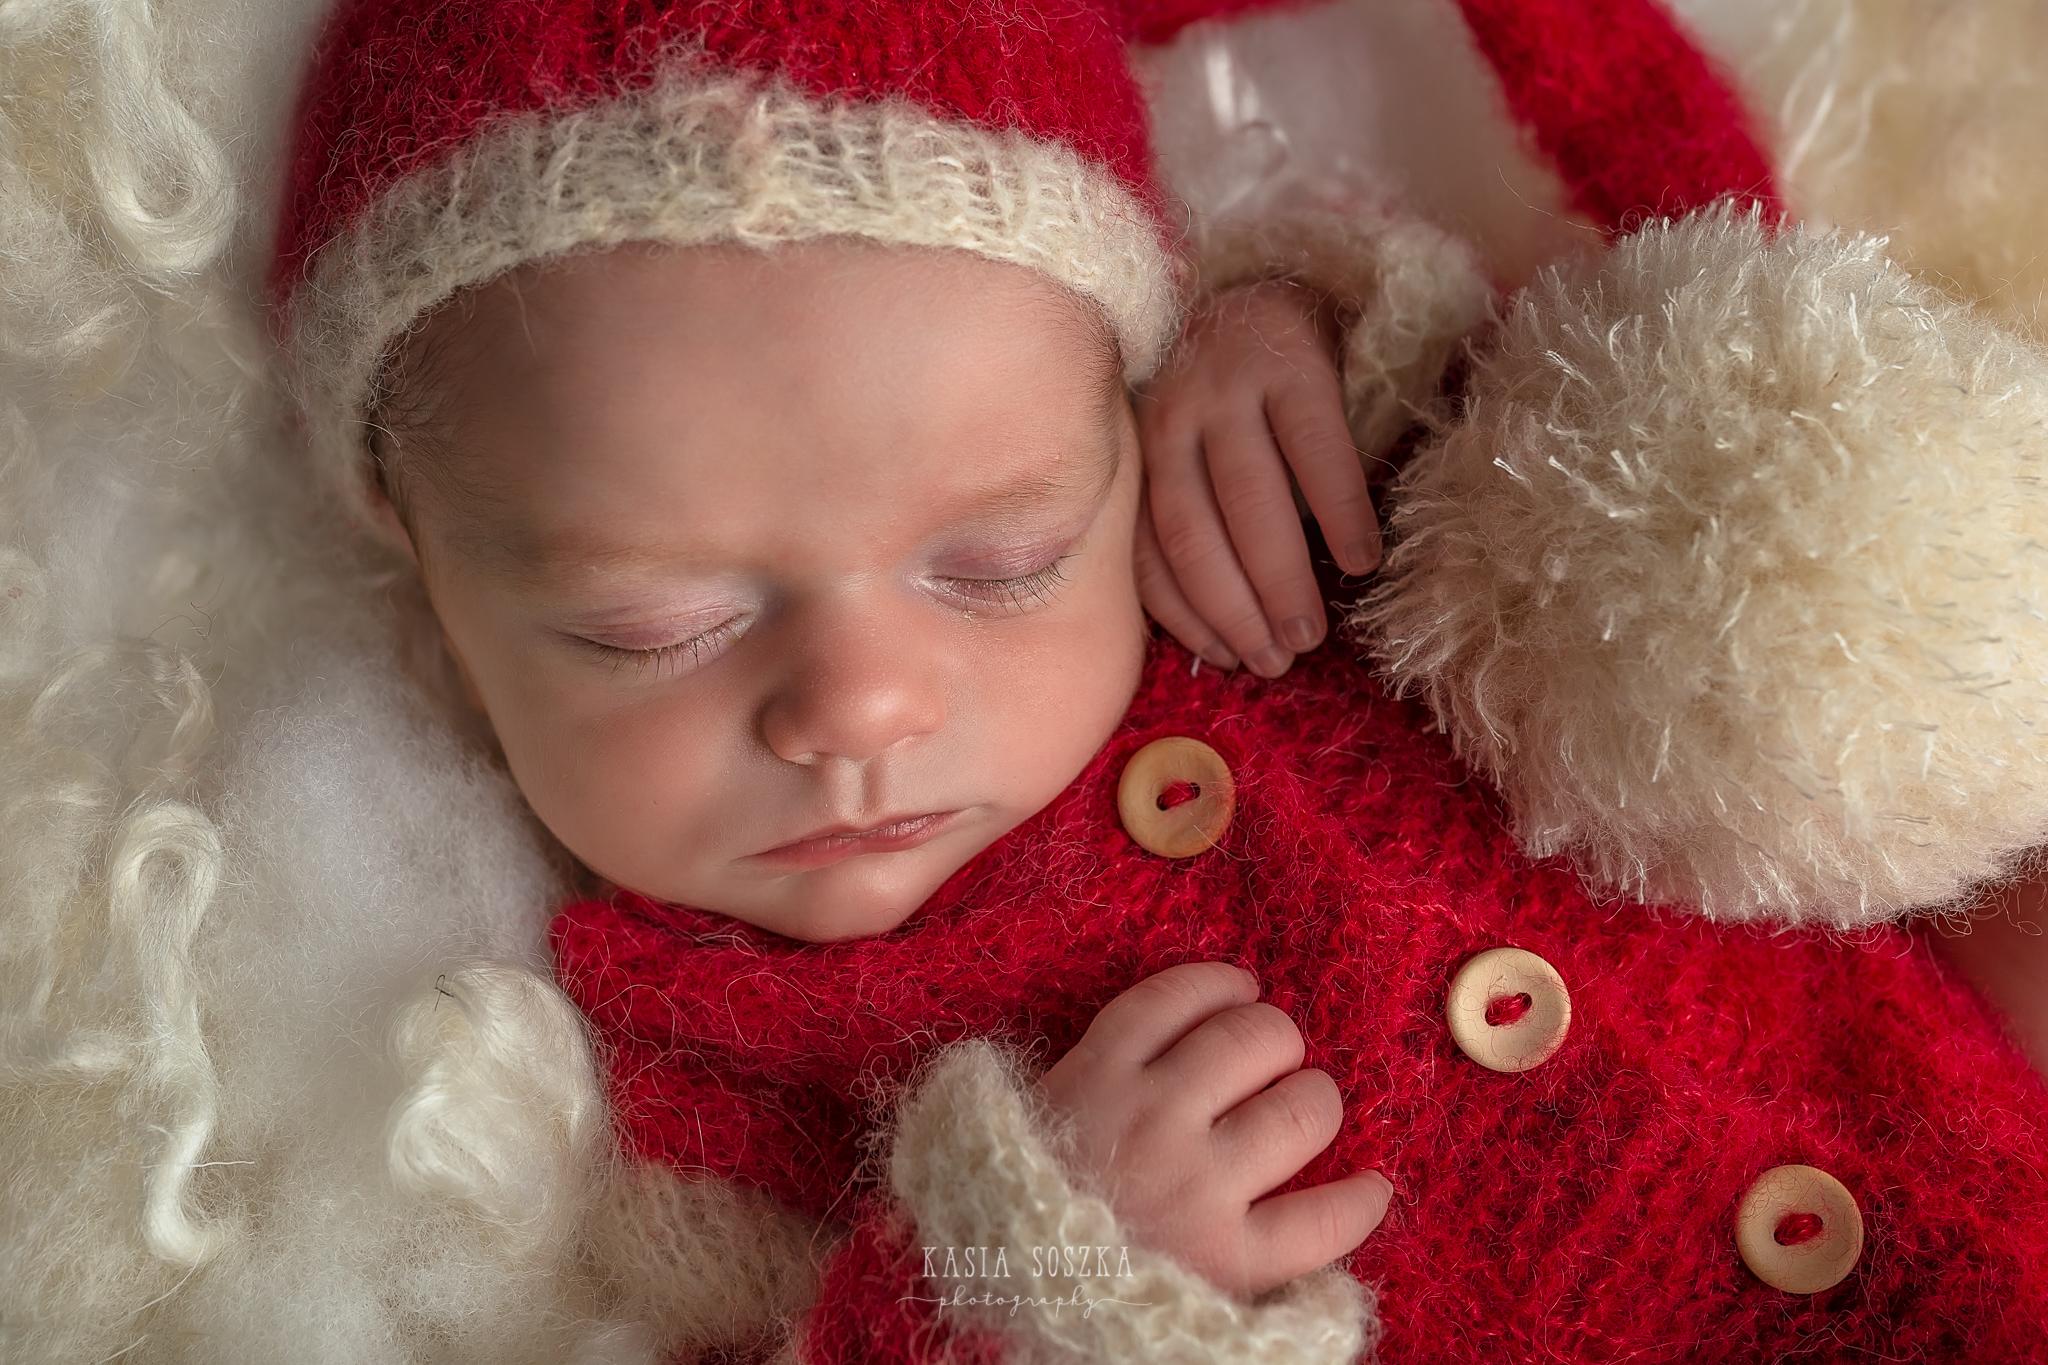 Newborn photography in Leeds near Bradford, York and Harrogate: cute newborn baby girl in Santa's outfit sleeping on a white fluffy blanket